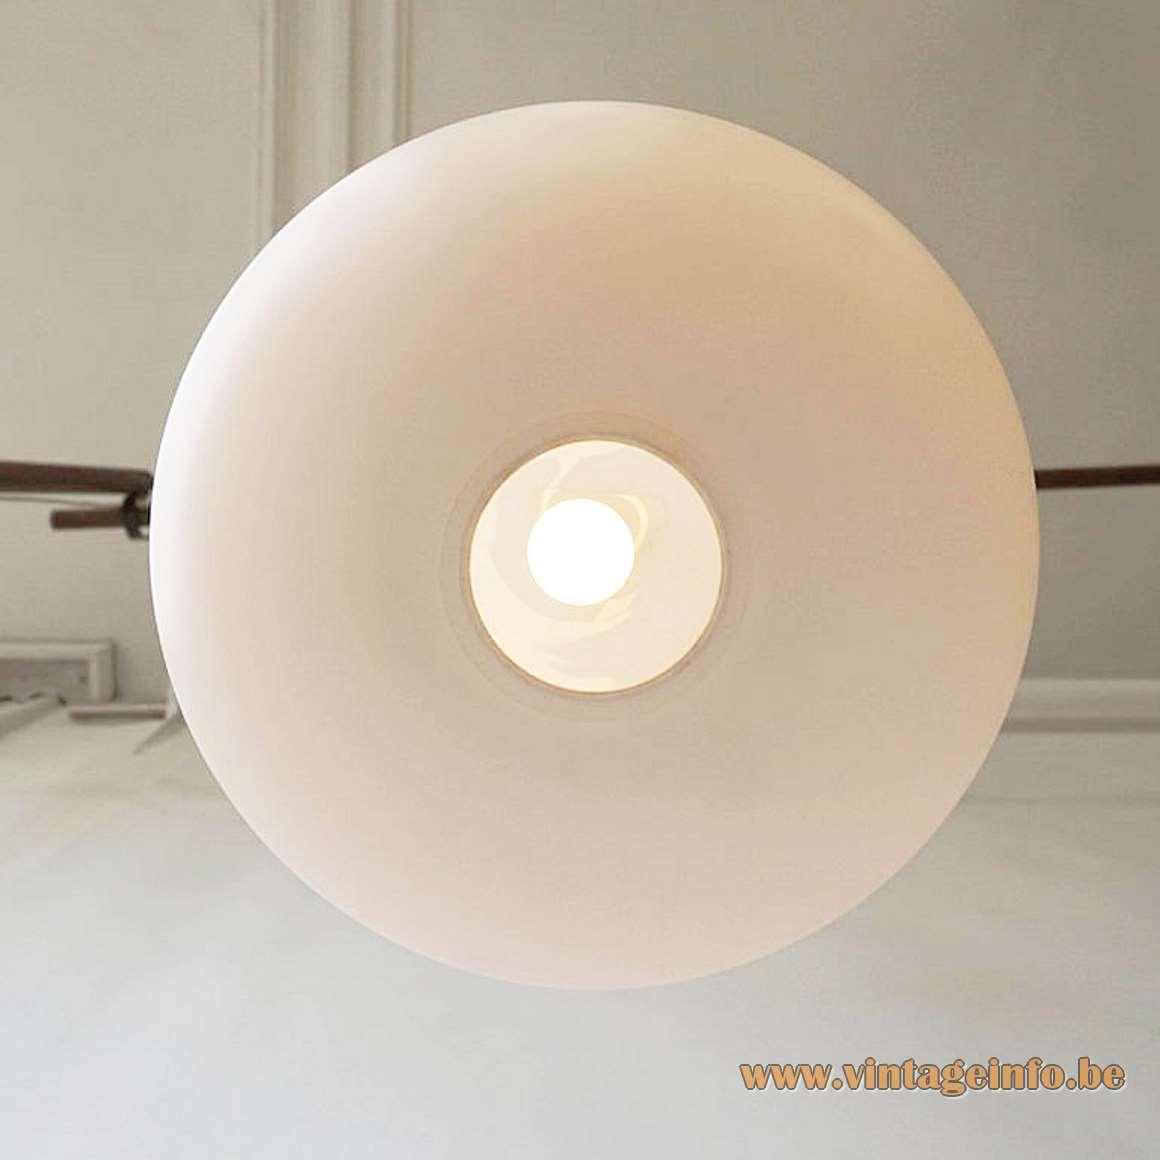 Luxus opal glass globe pendant lamp teak rod Designers: Uno & Östen Kristiansson 1960s Sweden MCM